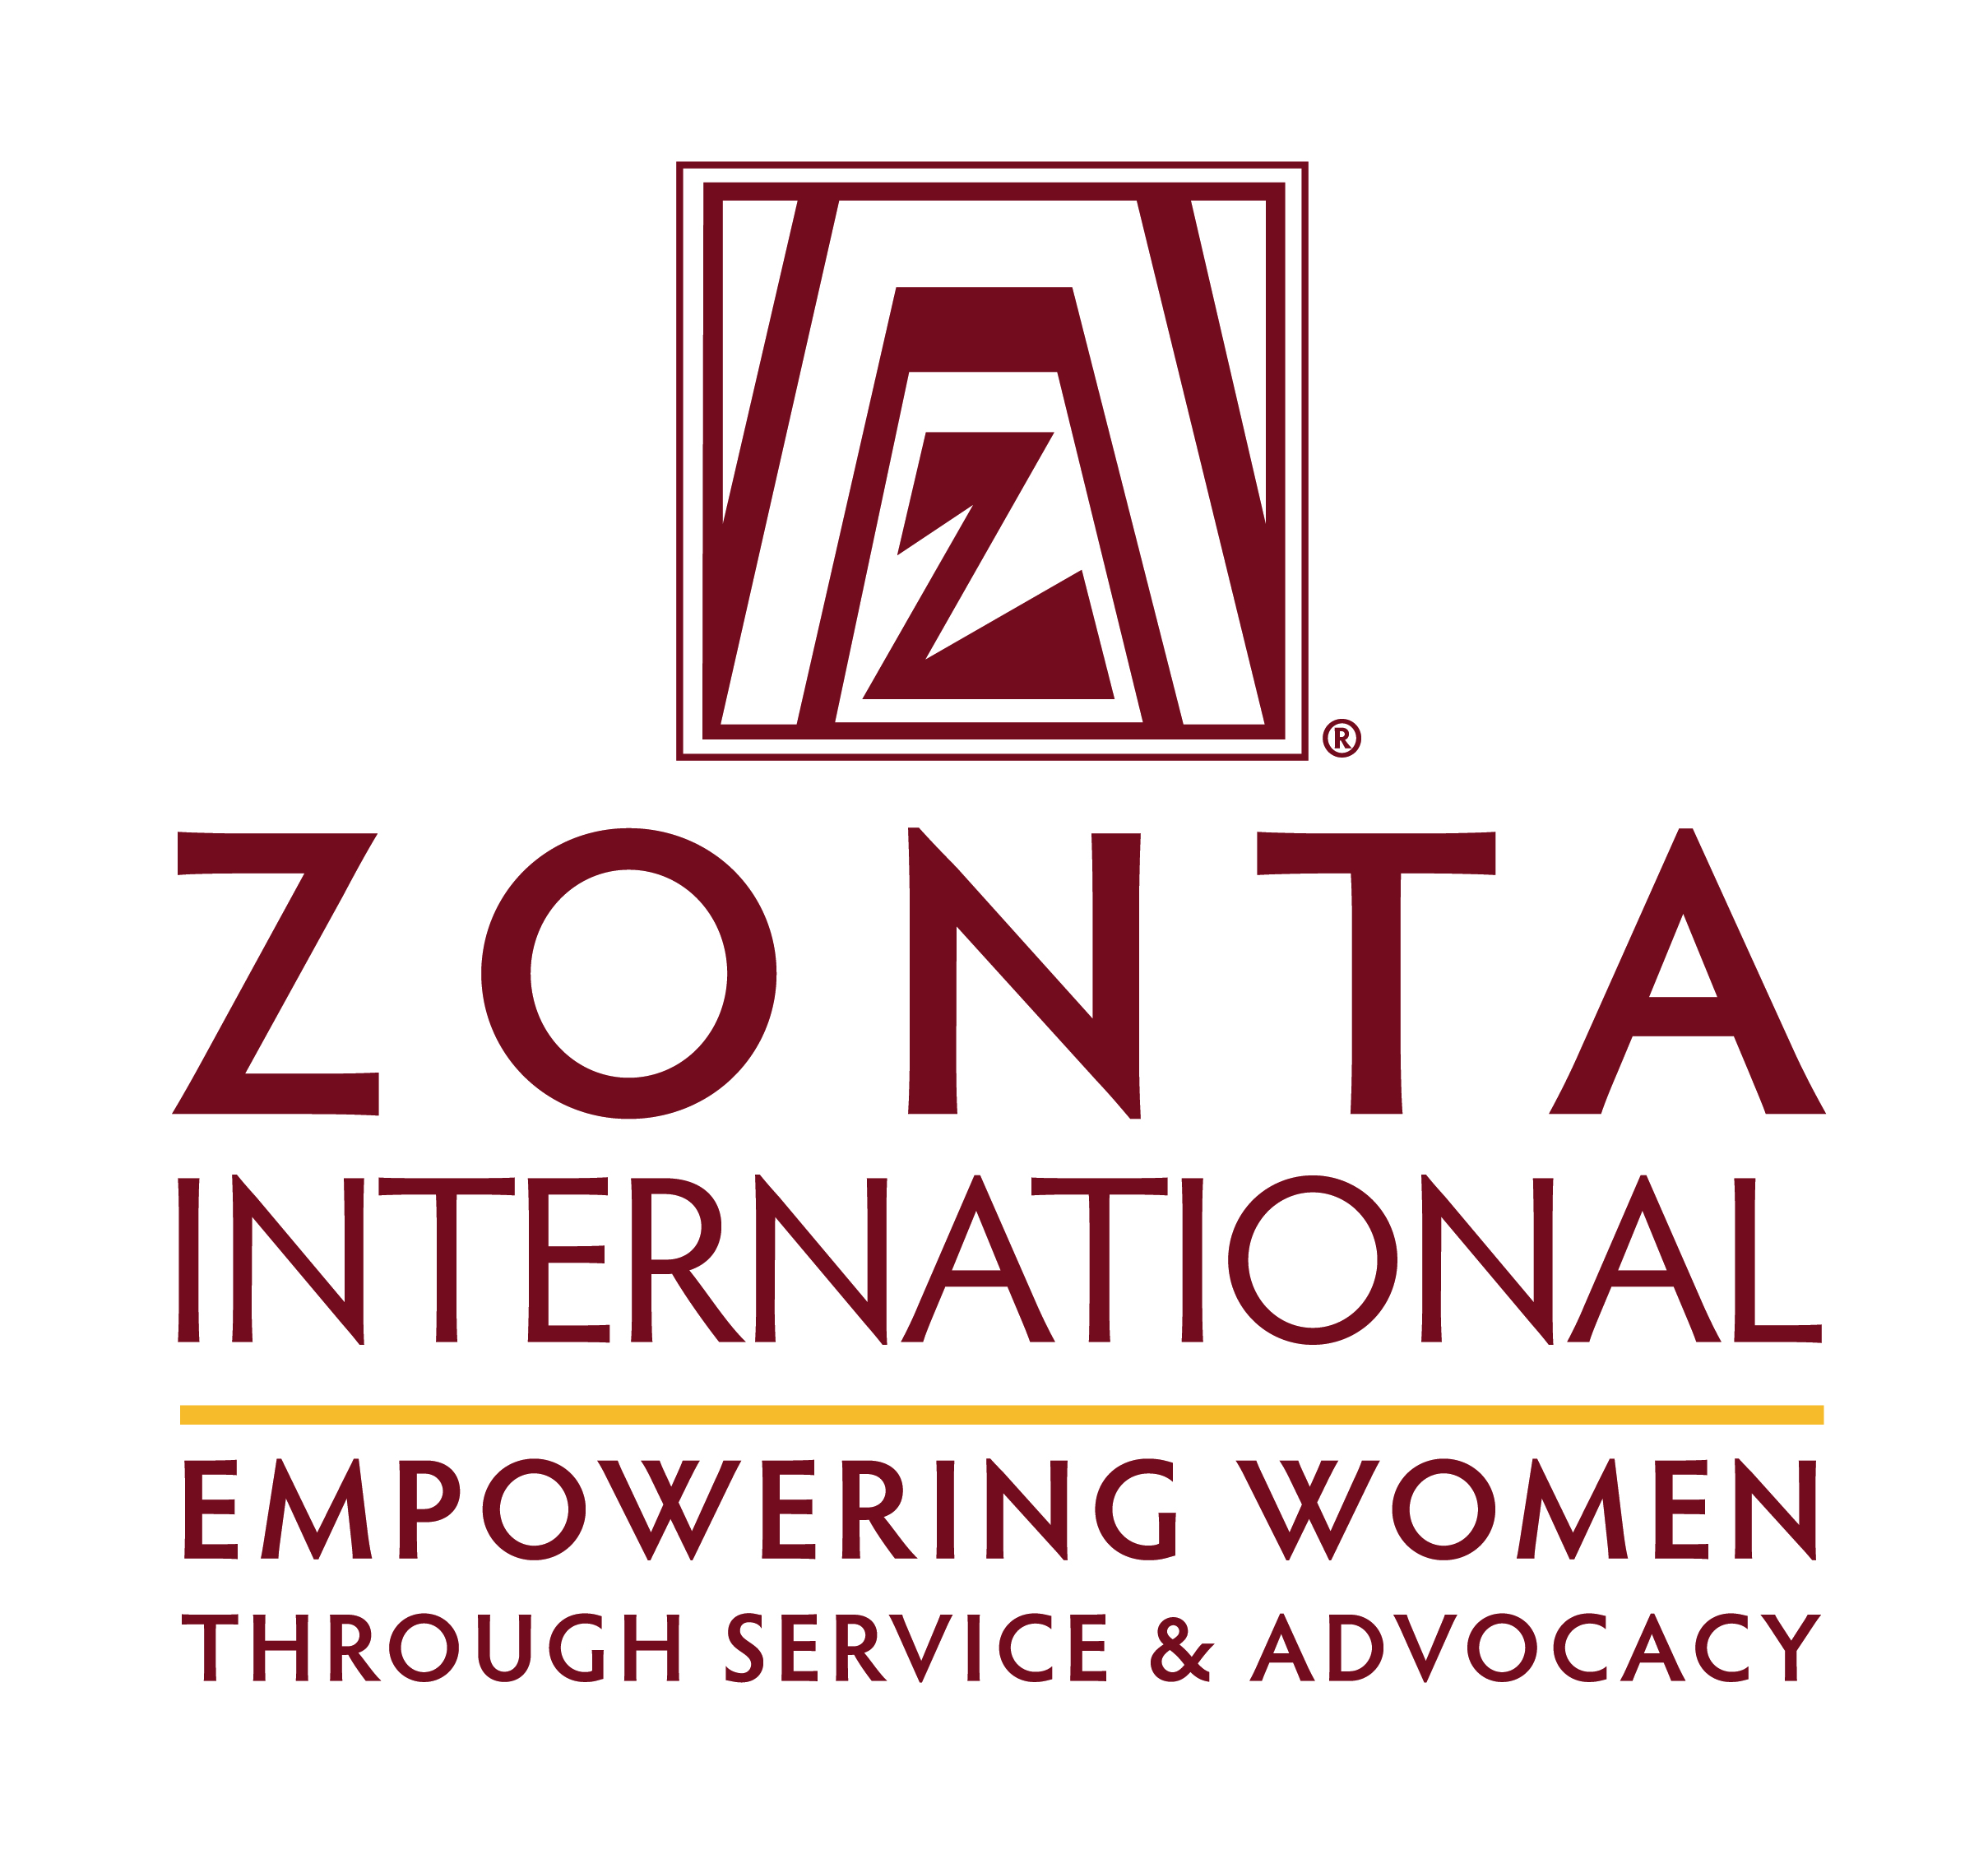 Zonta-International-Logo_Vertical_Color-high-res.jpg